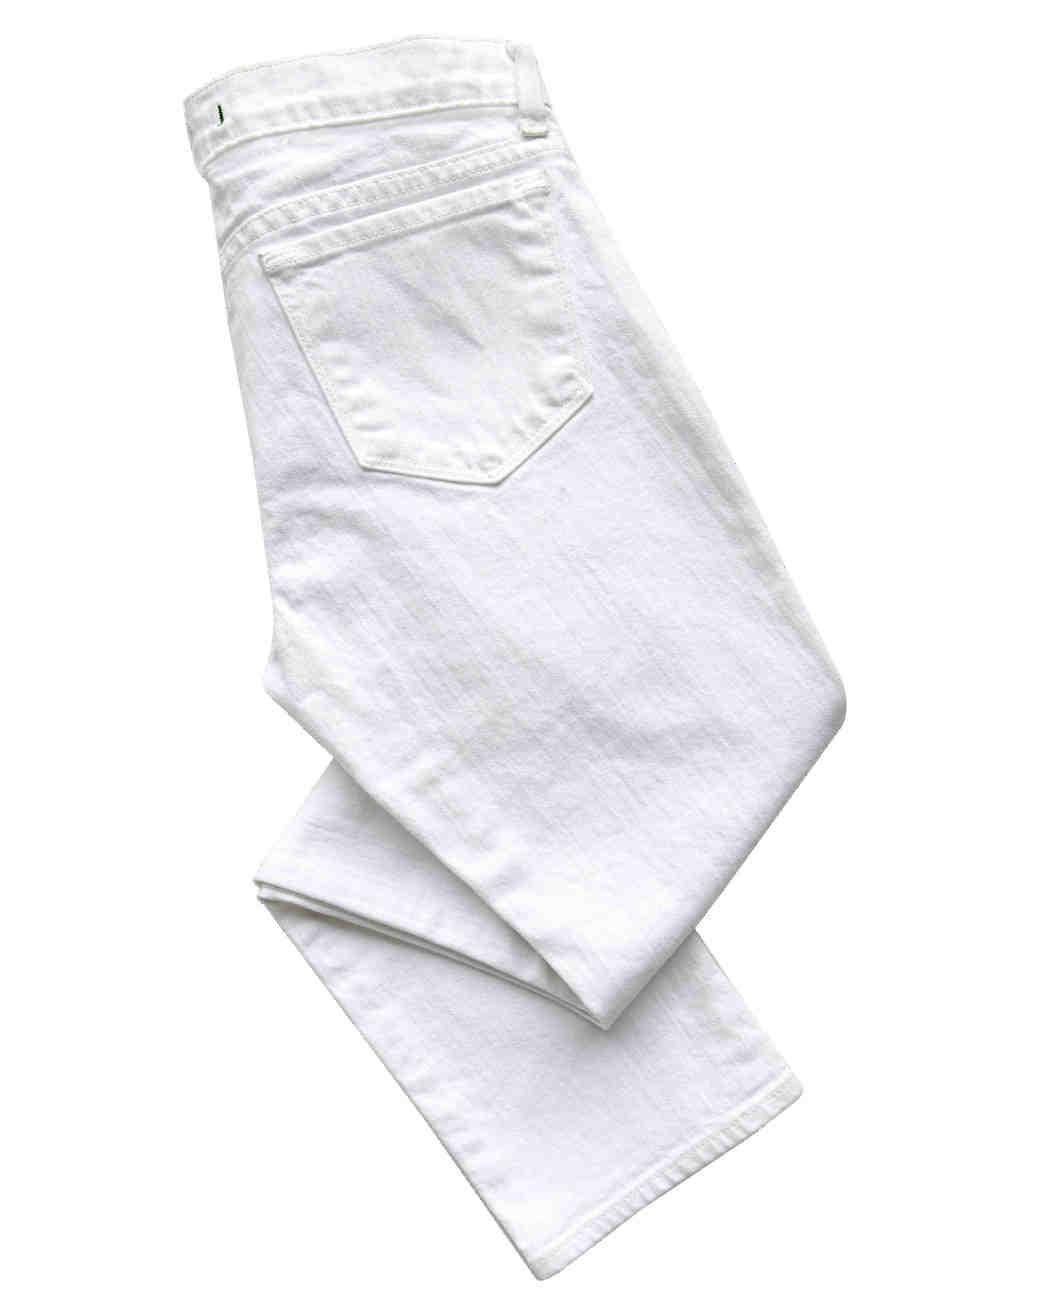 travel-accessories-white-pants-mwd107619.jpg